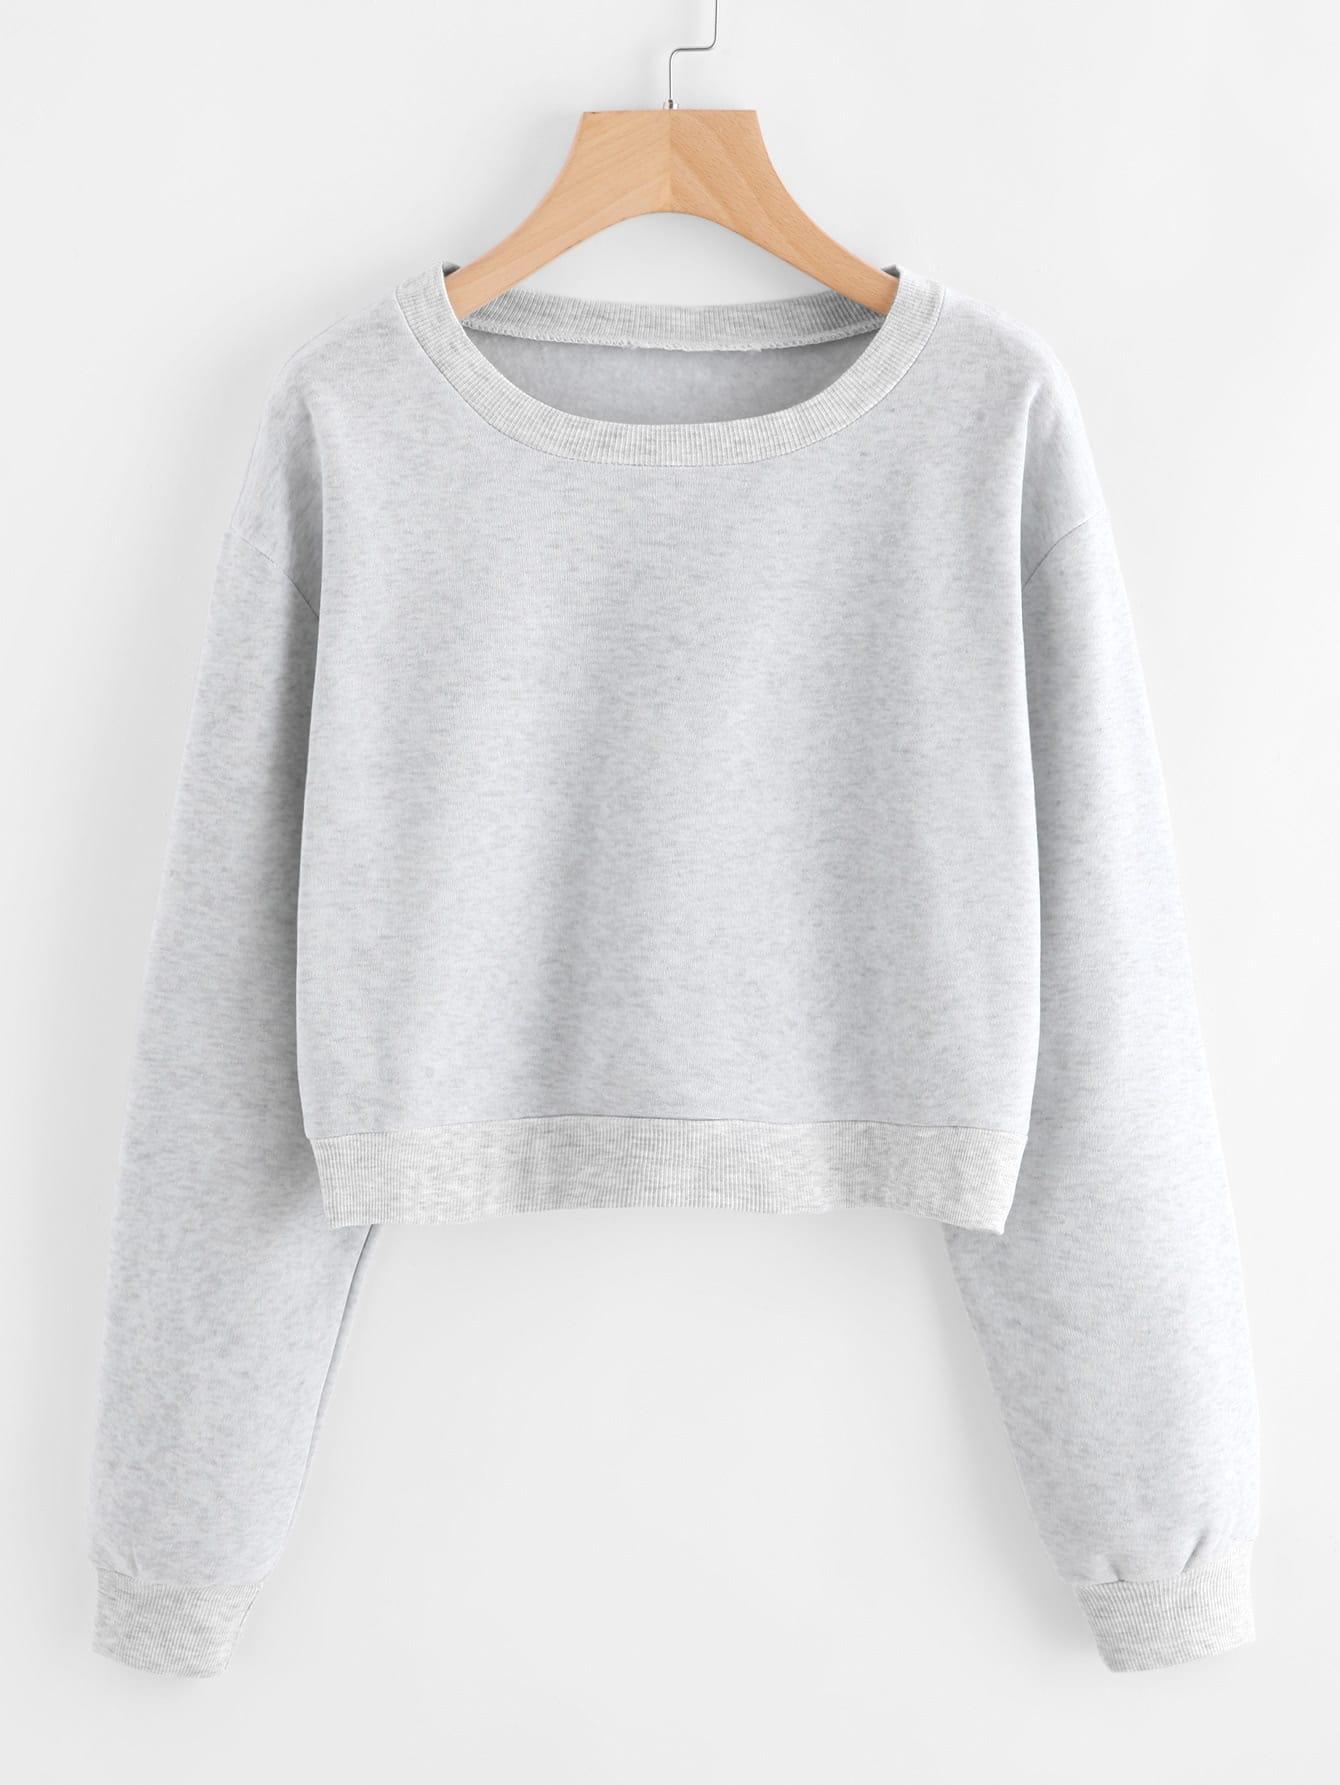 Drop Shoulder Ribbed Trim Crop Pullover sweatshirt170925103